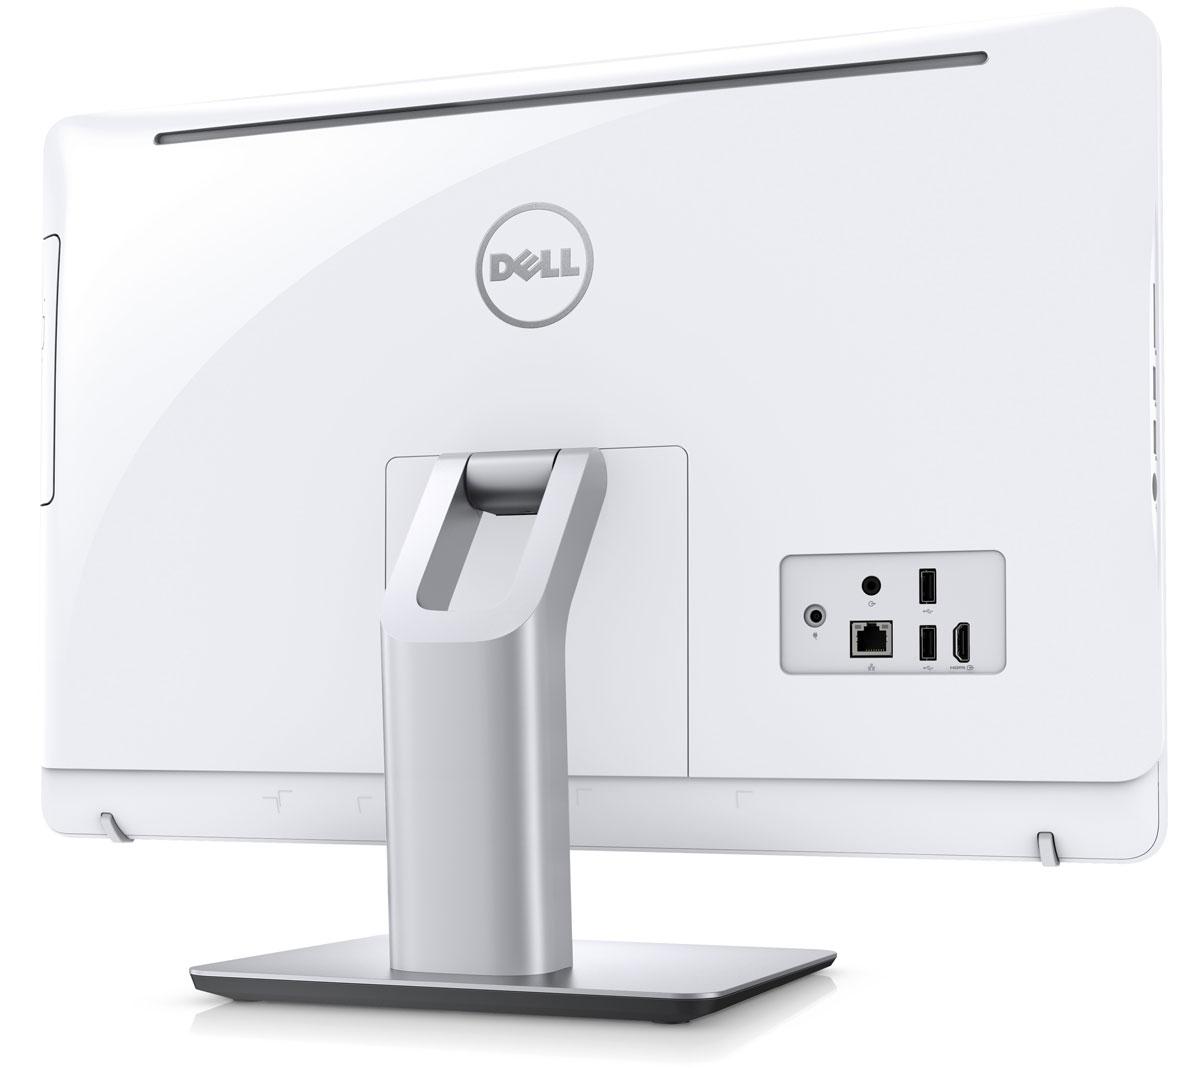 Dell Inspiron 3263-0700, White моноблок